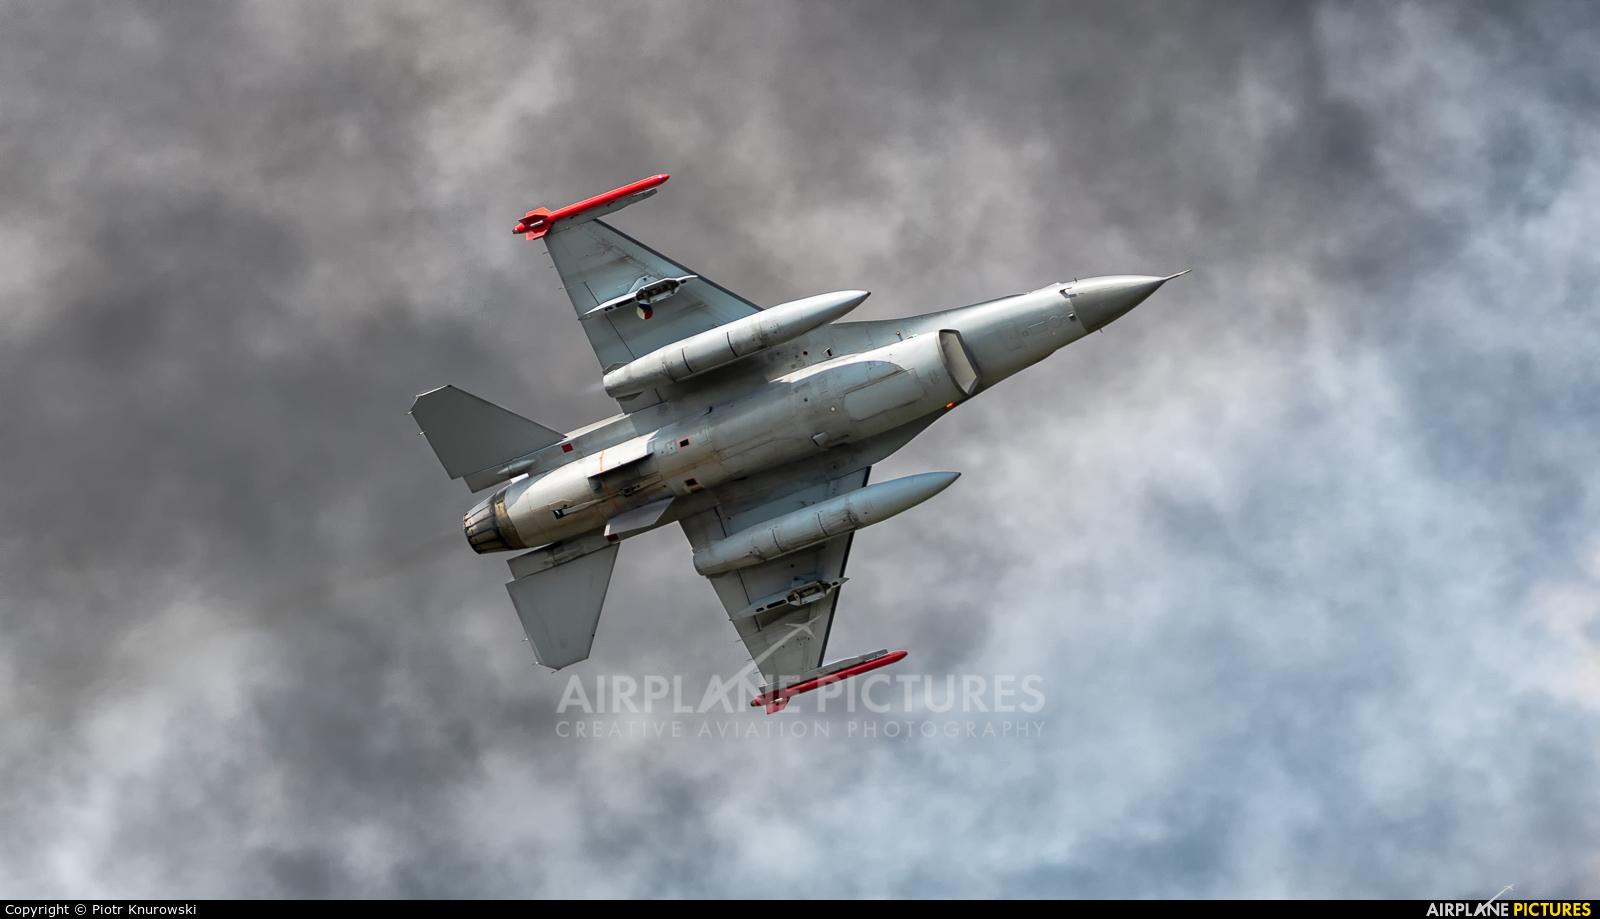 Netherlands - Air Force J-021 aircraft at Uden - Volkel